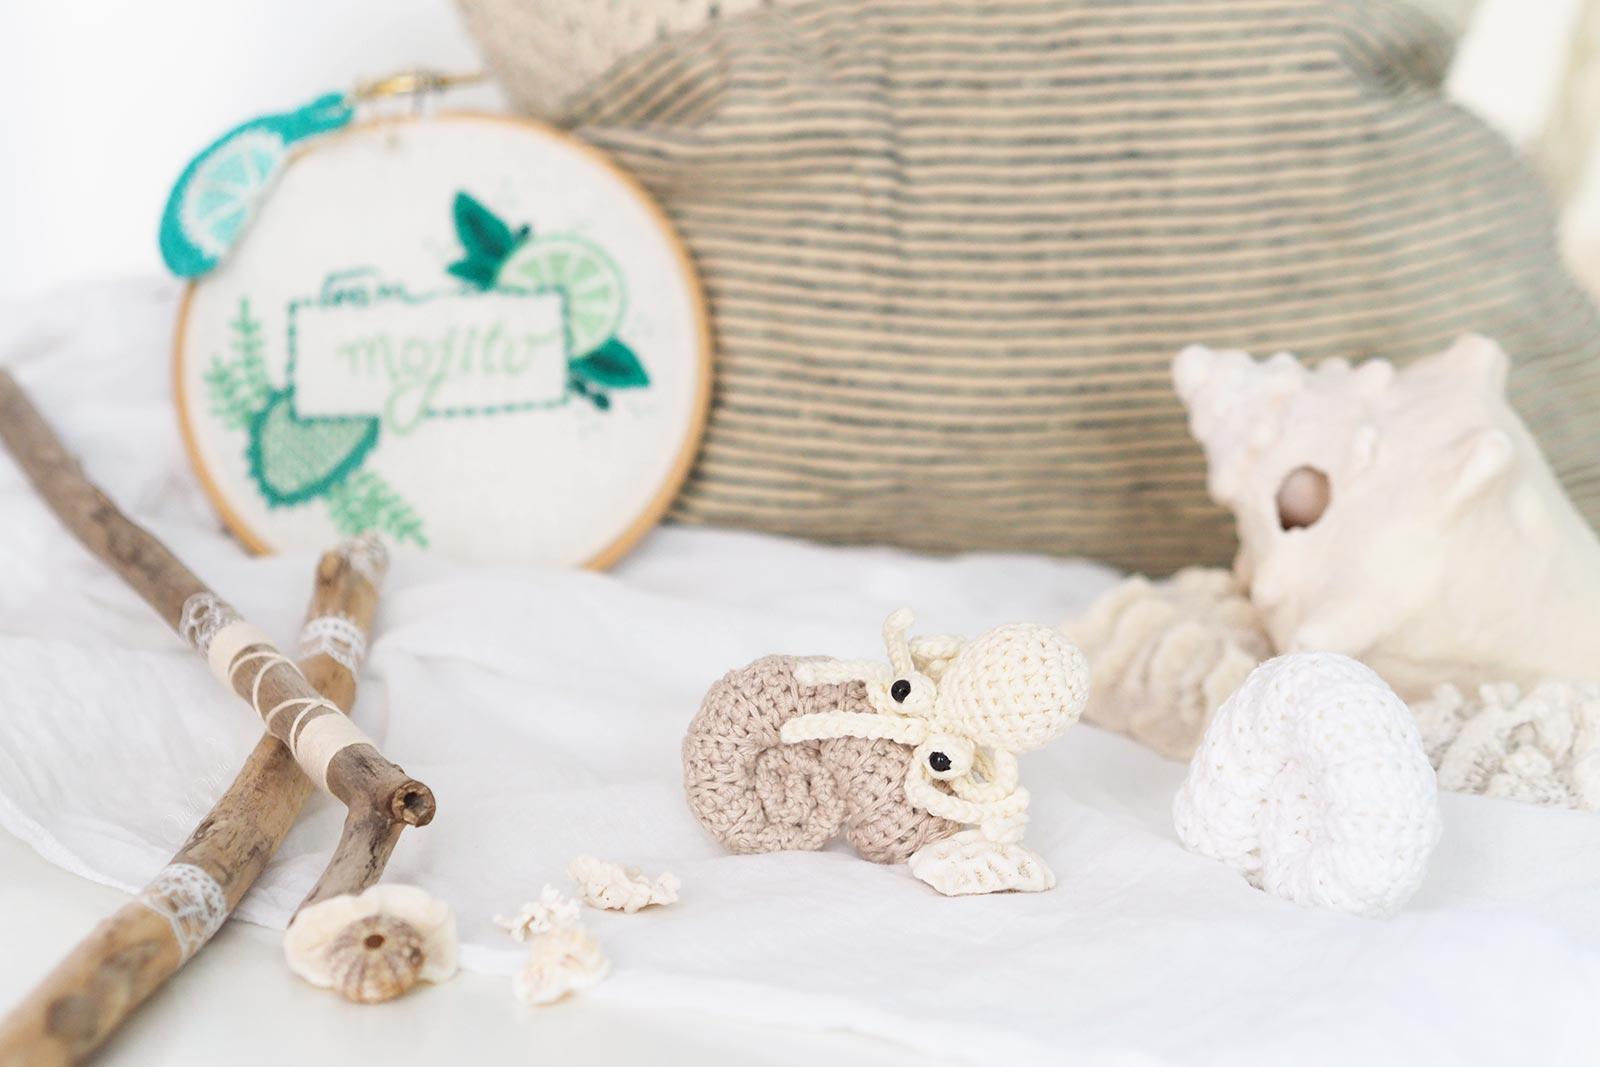 crochet-mini-poulpe-coquillage-nautile-kezakoflo-laboutiquedemelimelo